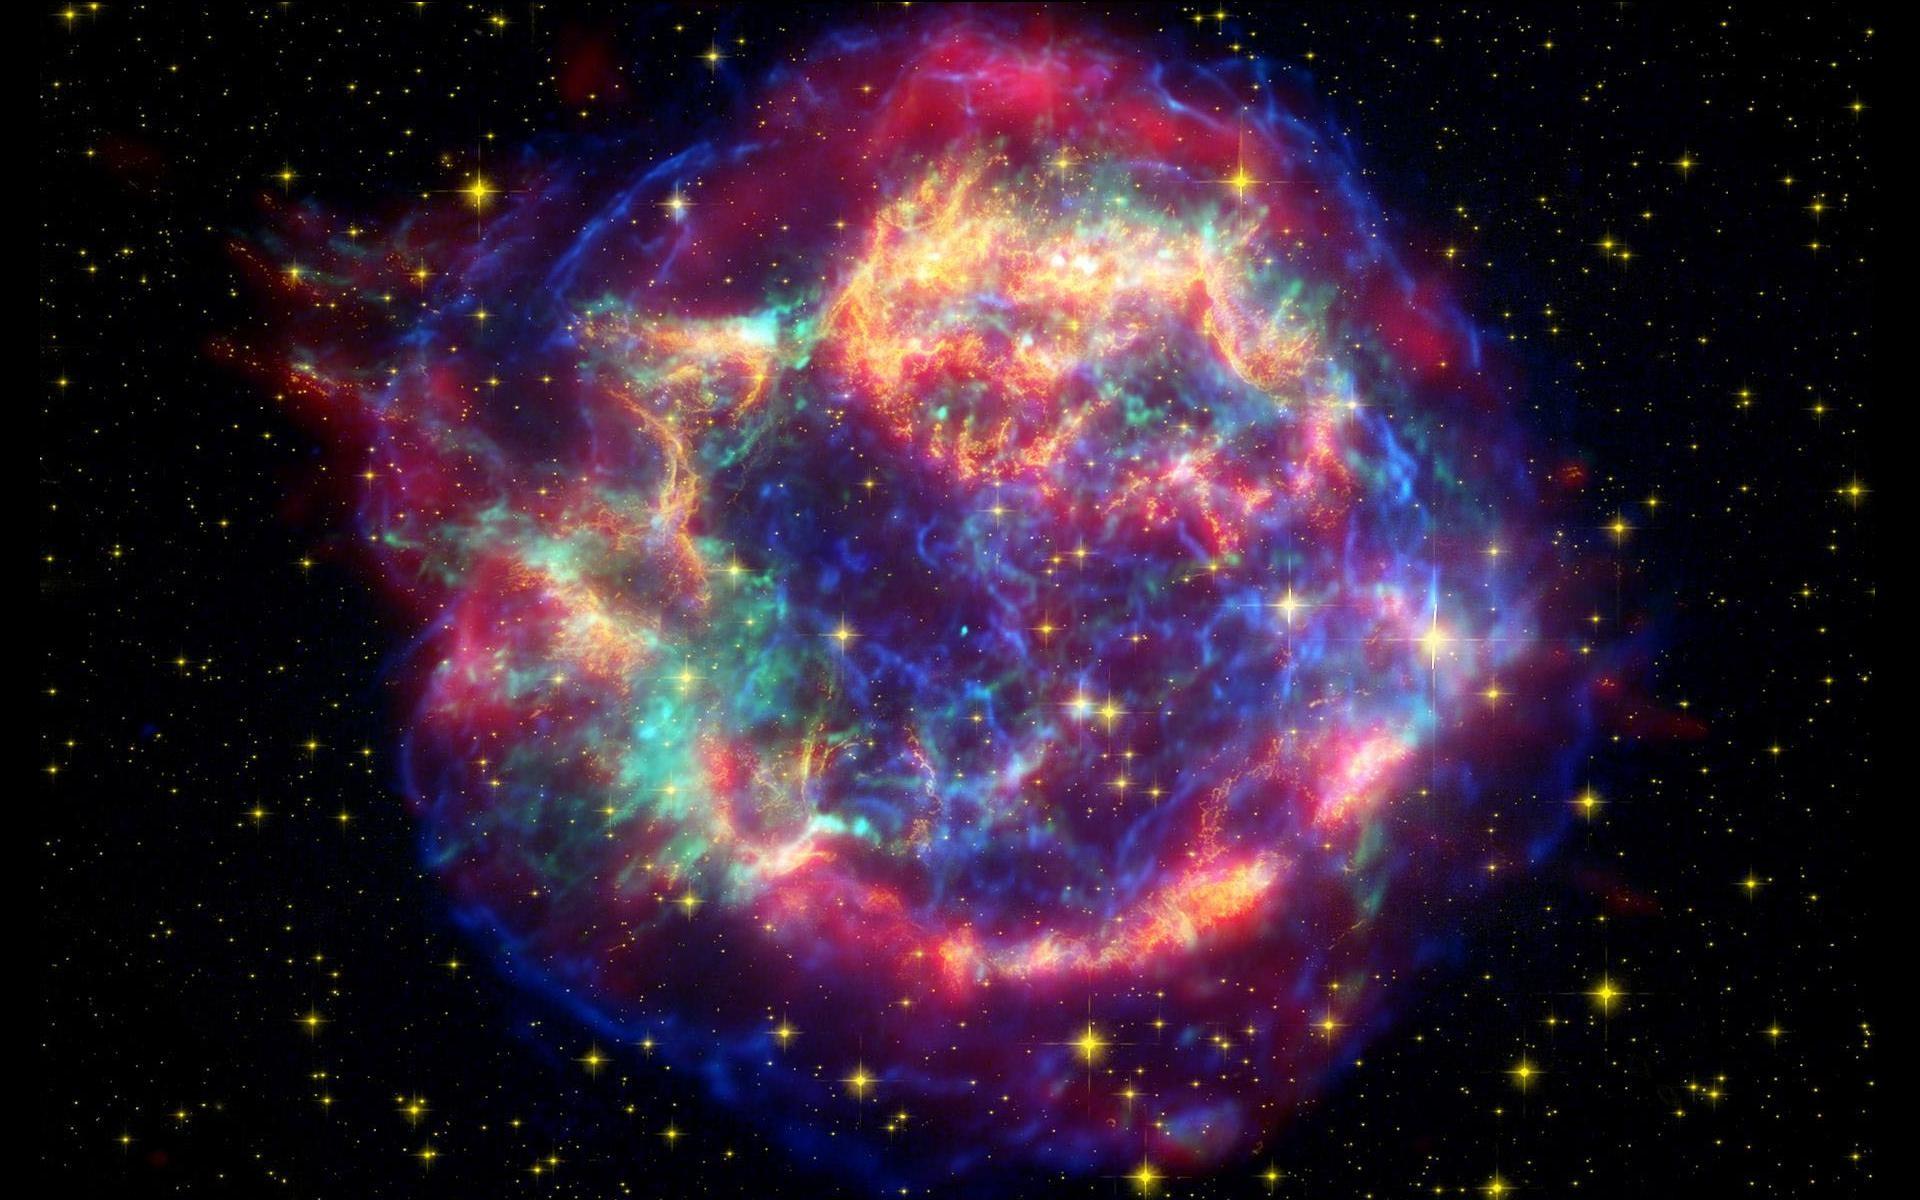 3440x1440 ultrawide Astrophotography Space Blue Wallpapers HD Desktop